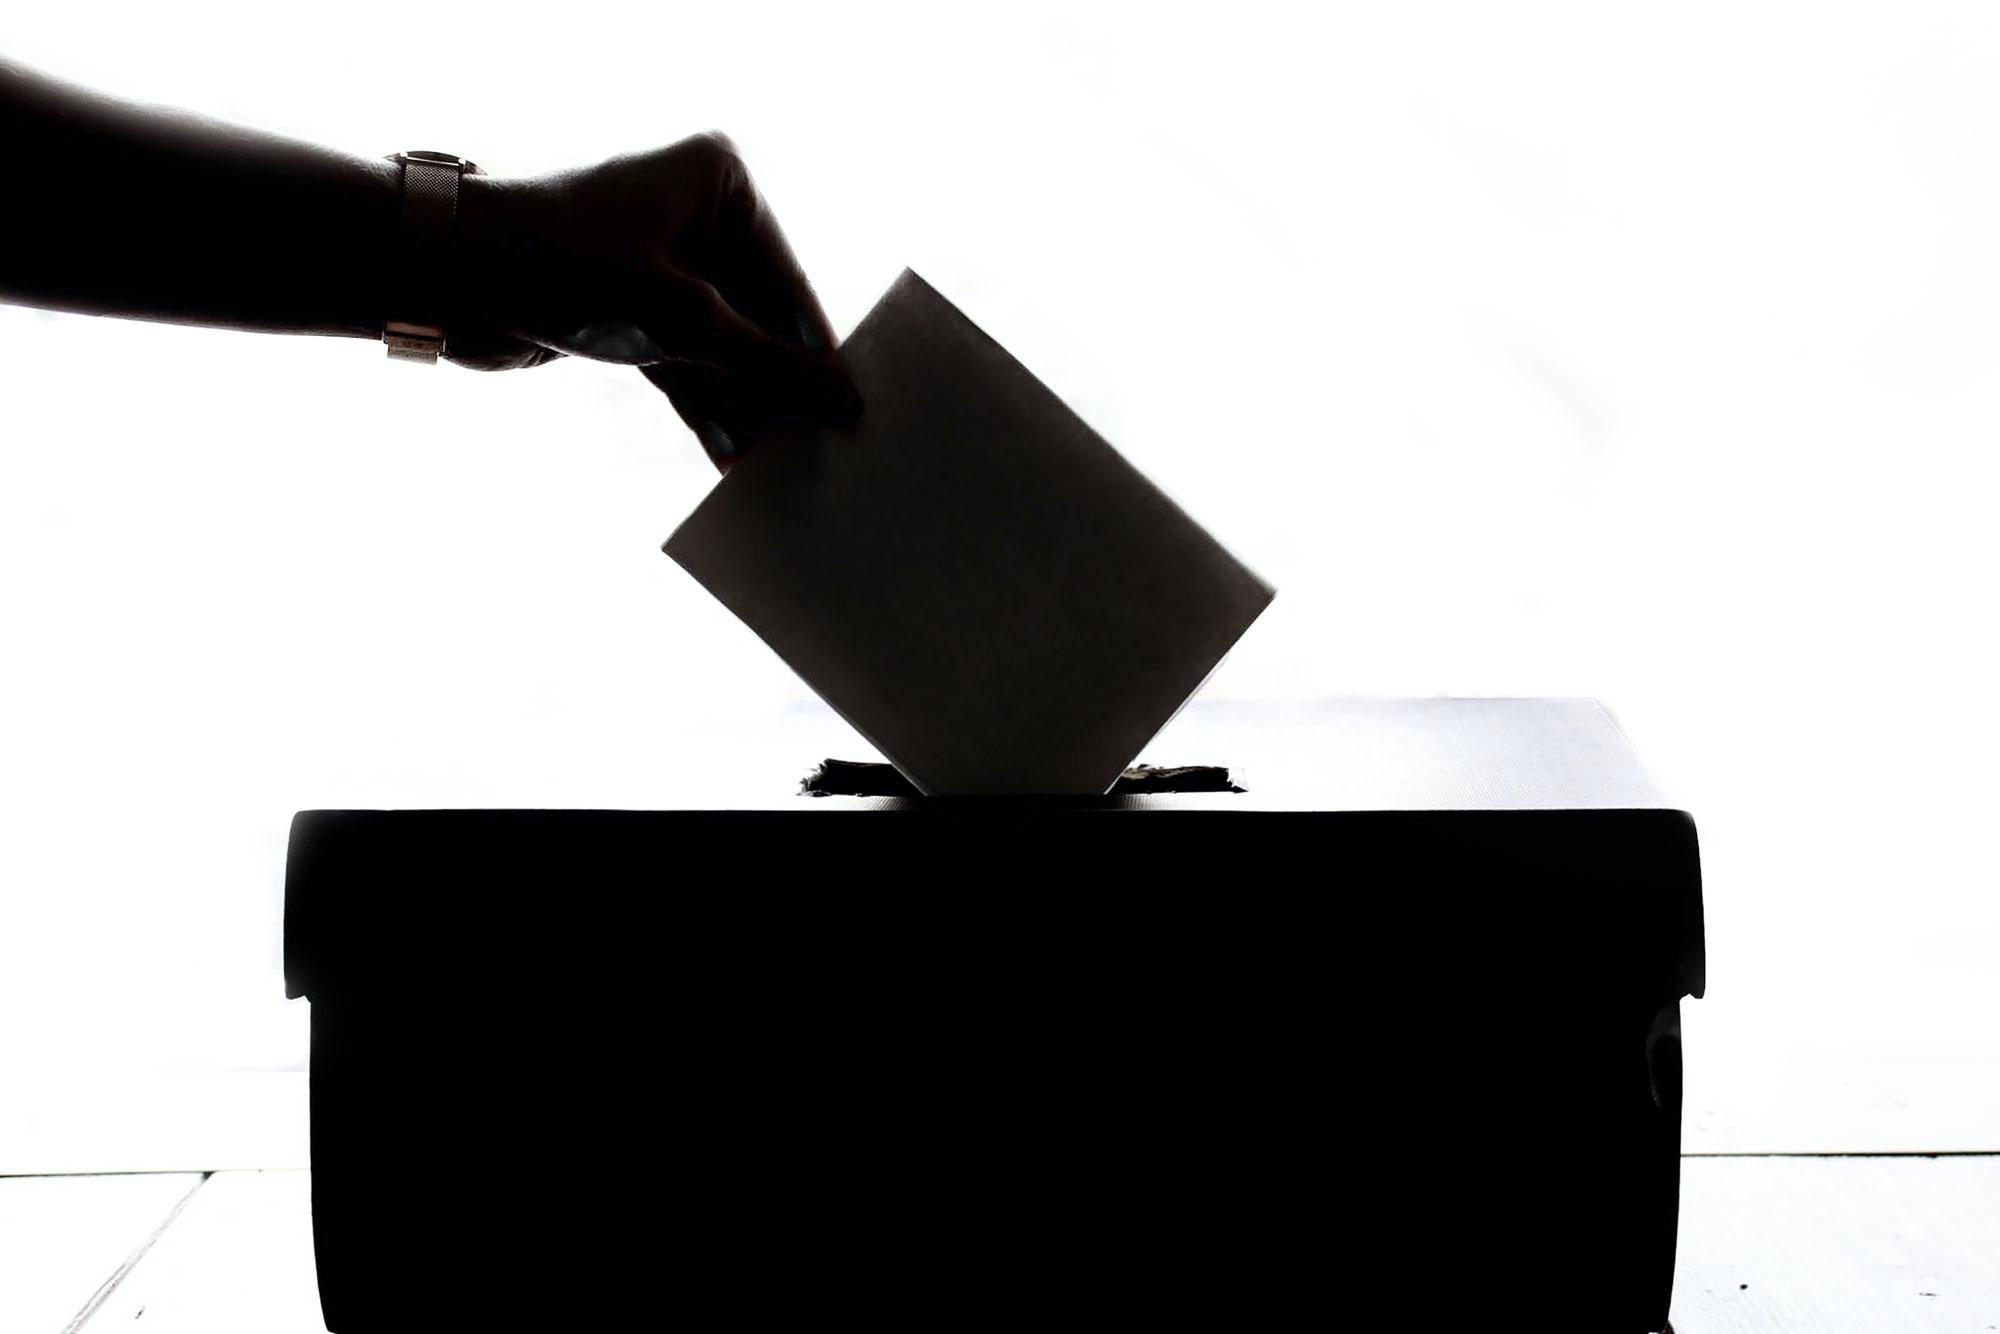 SPD in Lotte klarer Gewinner der Kommunalwahl